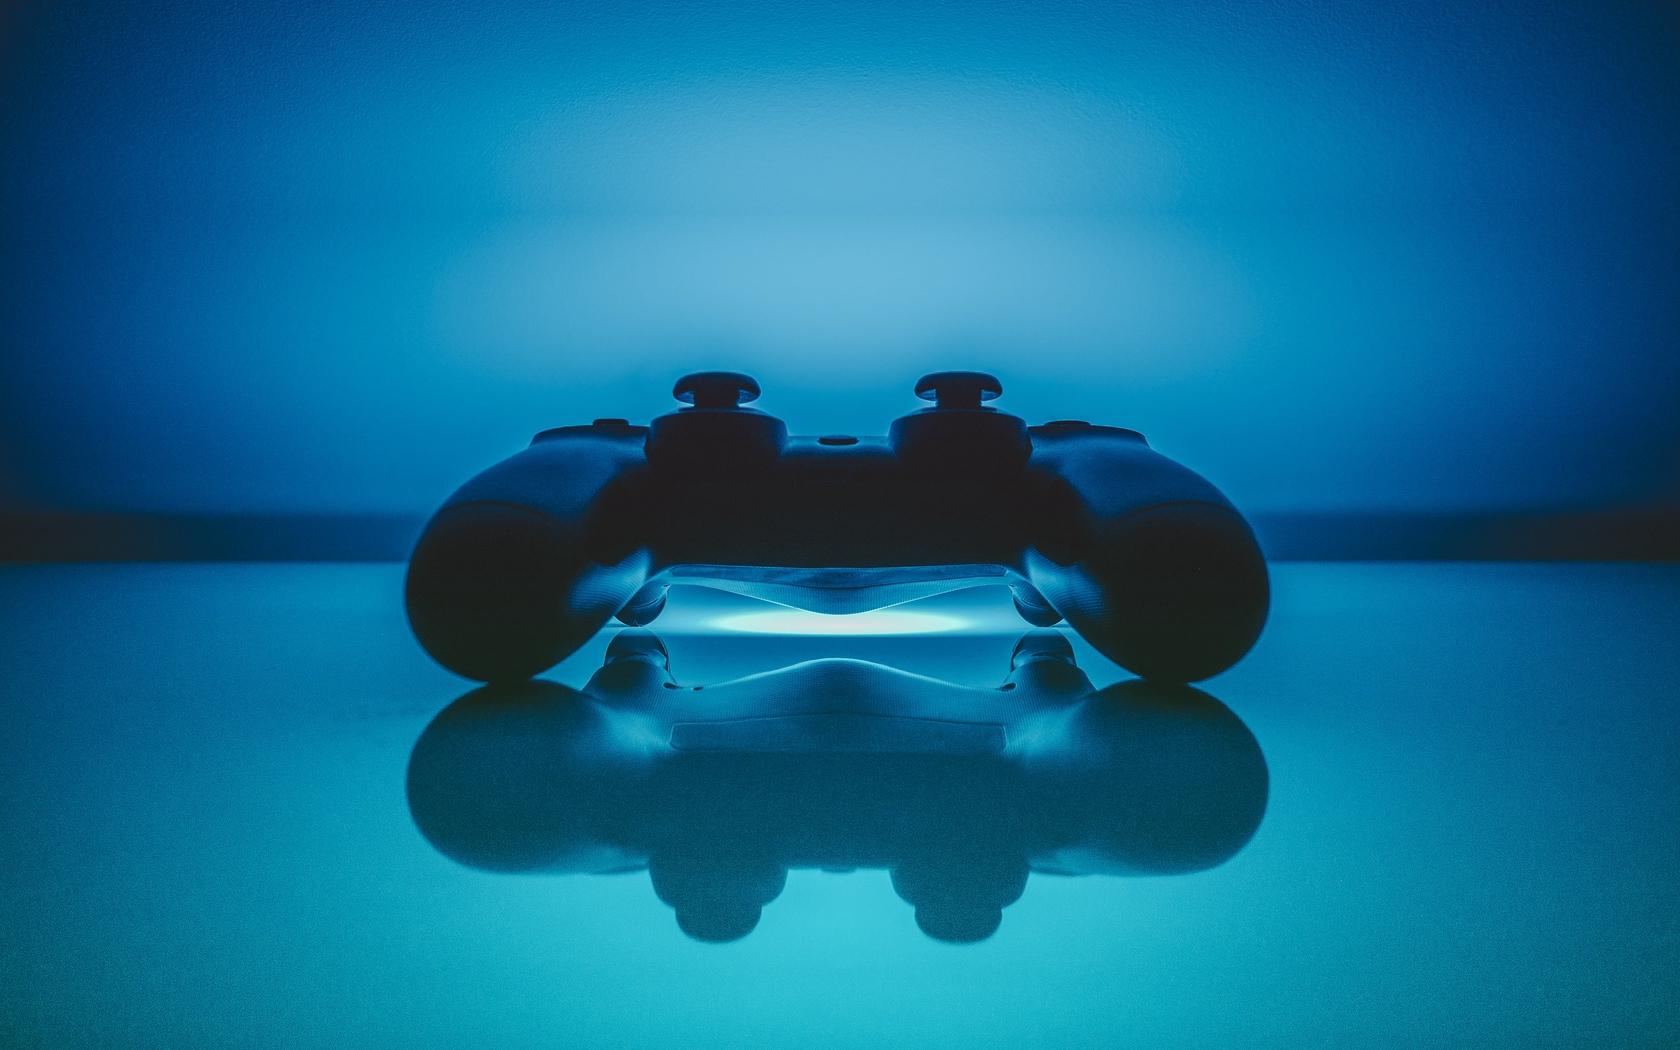 Download wallpaper 1680x1050 joystick controller gamepad 1680x1050